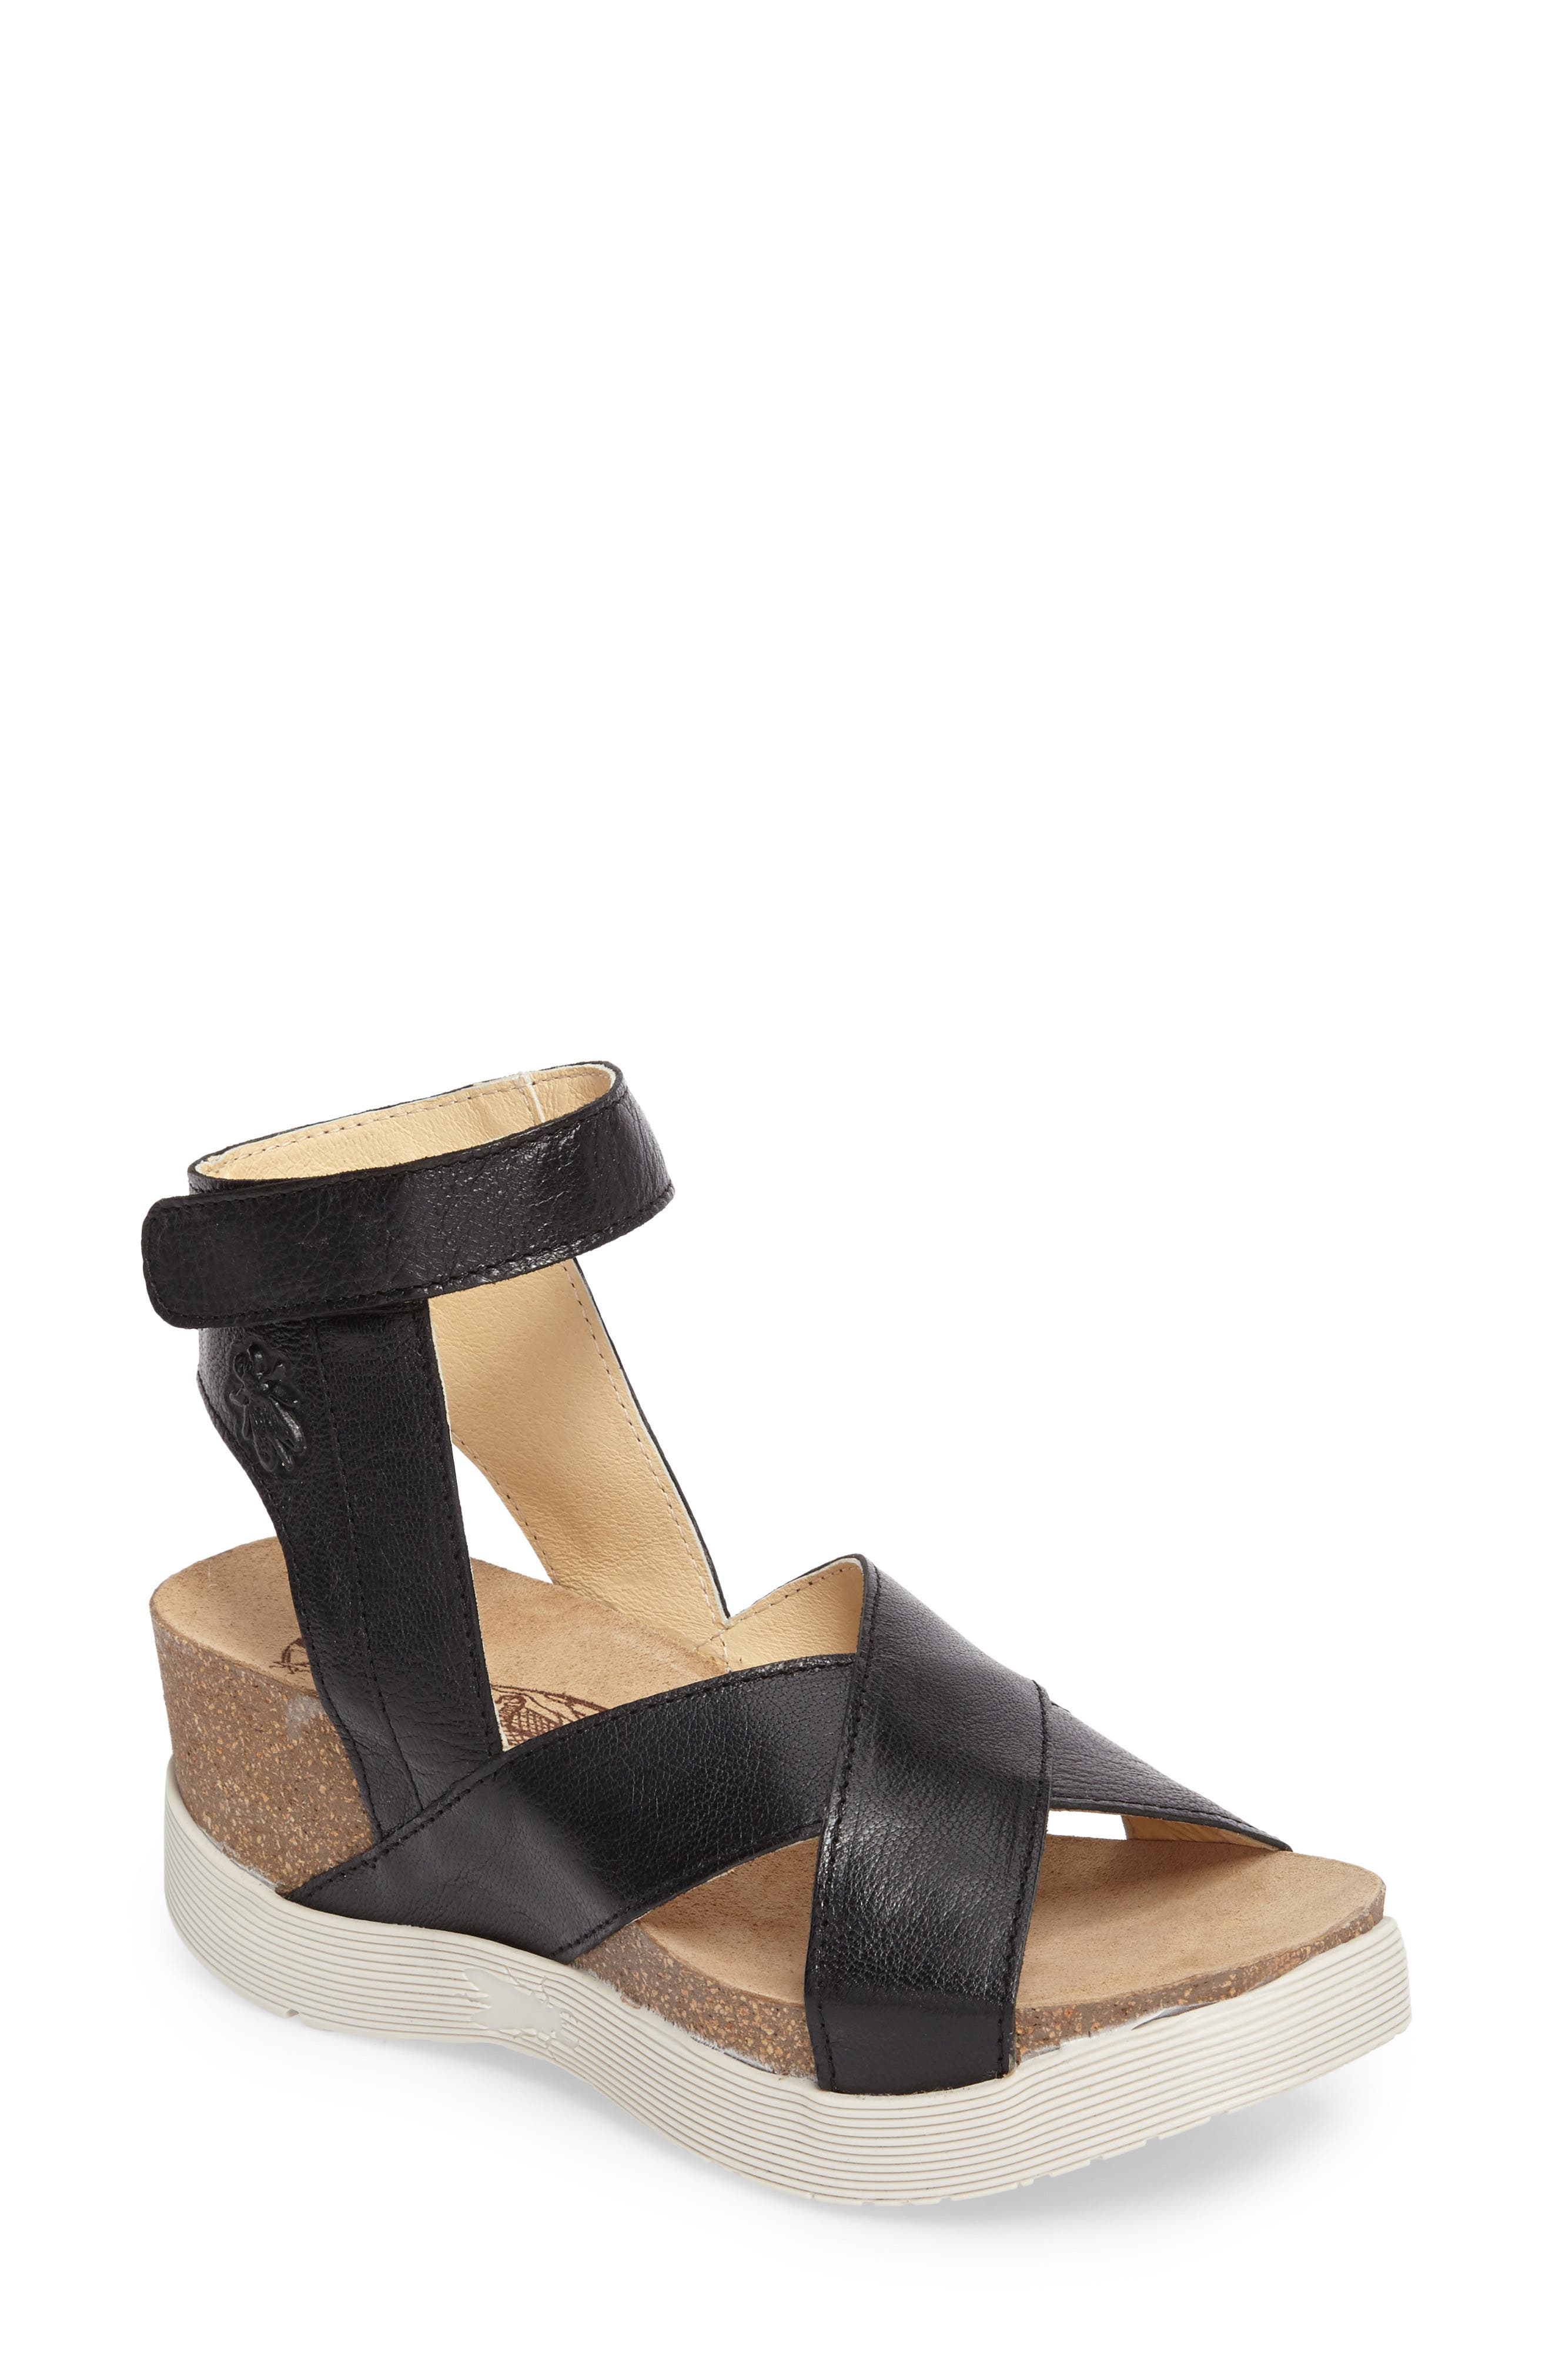 Fly London Weel Nubuck Leather Platform Sandal,